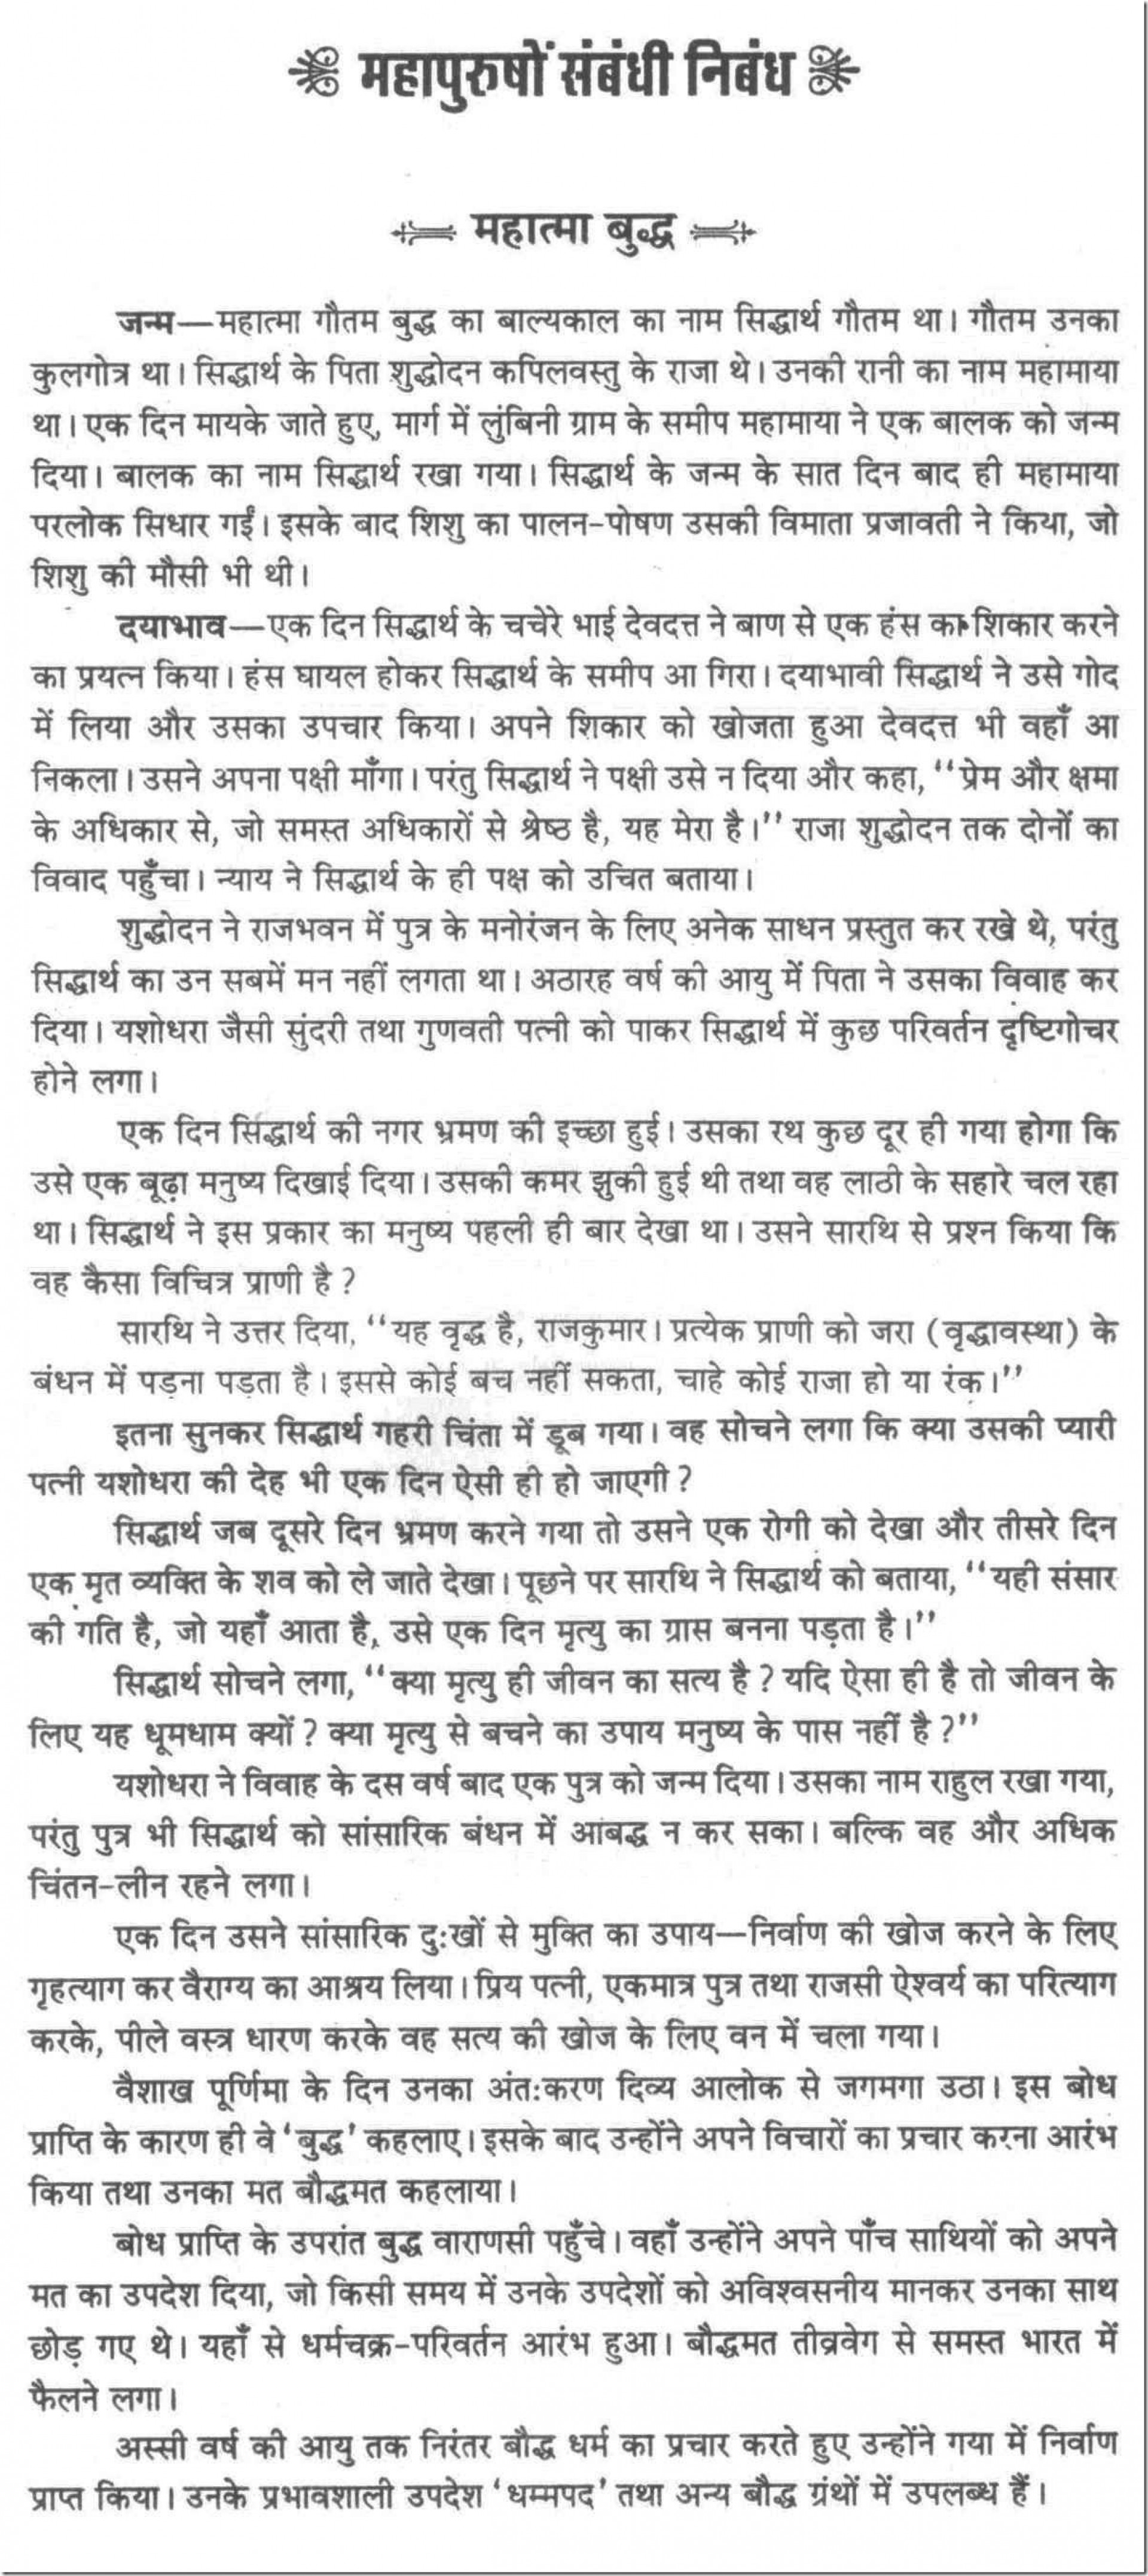 005 Essay Example Hinduism Surprising Questions Hindu Muslim Ekta In Hindi And Buddhism Introduction 1920